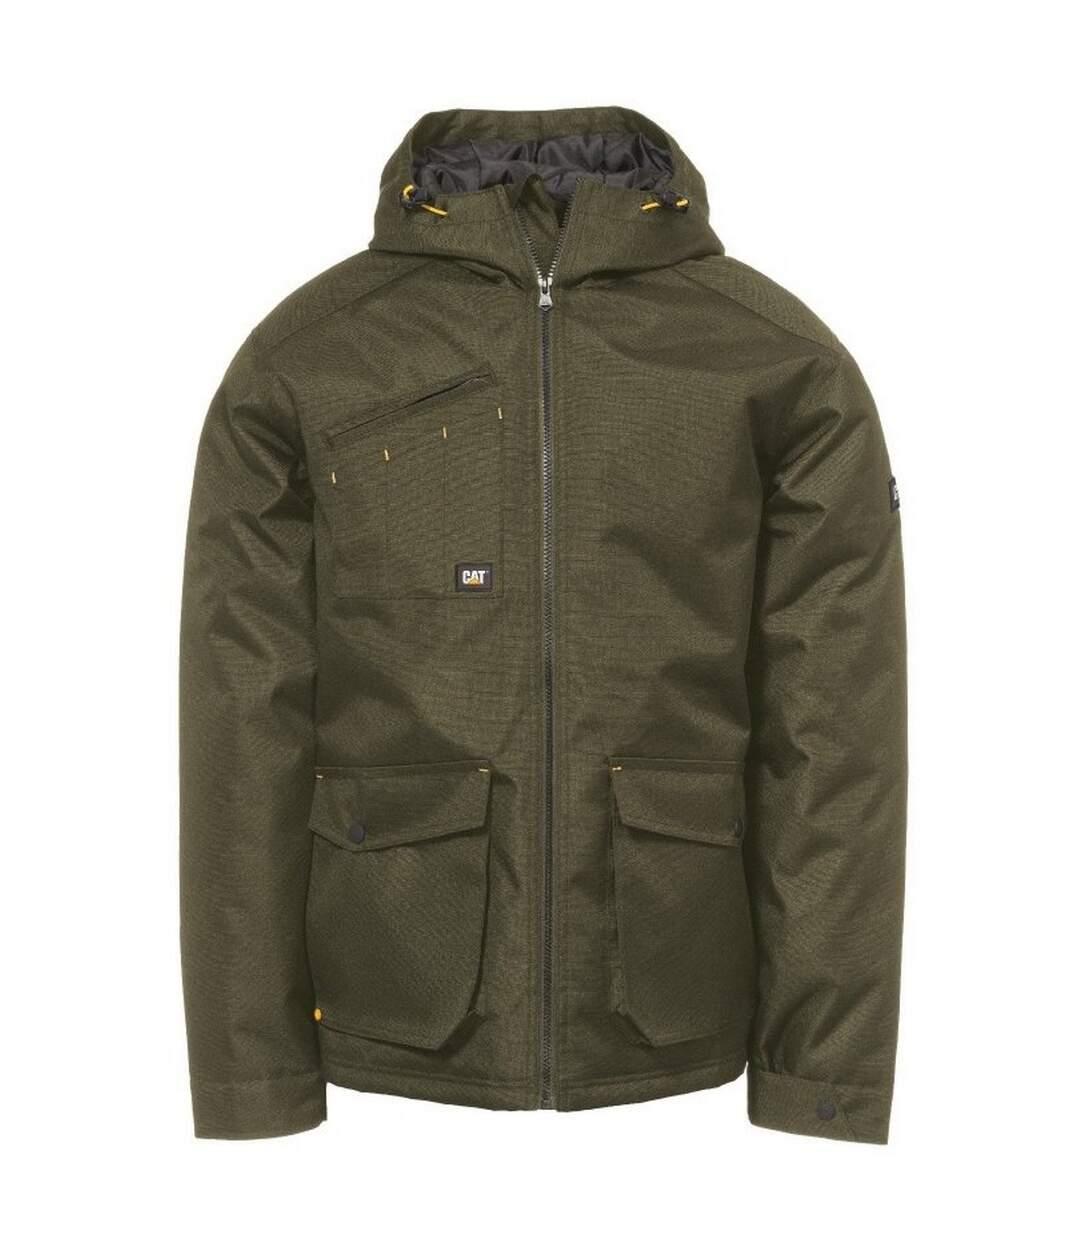 Caterpillar Mens Battleridge Jacket (Army Moss) - UTFS4640